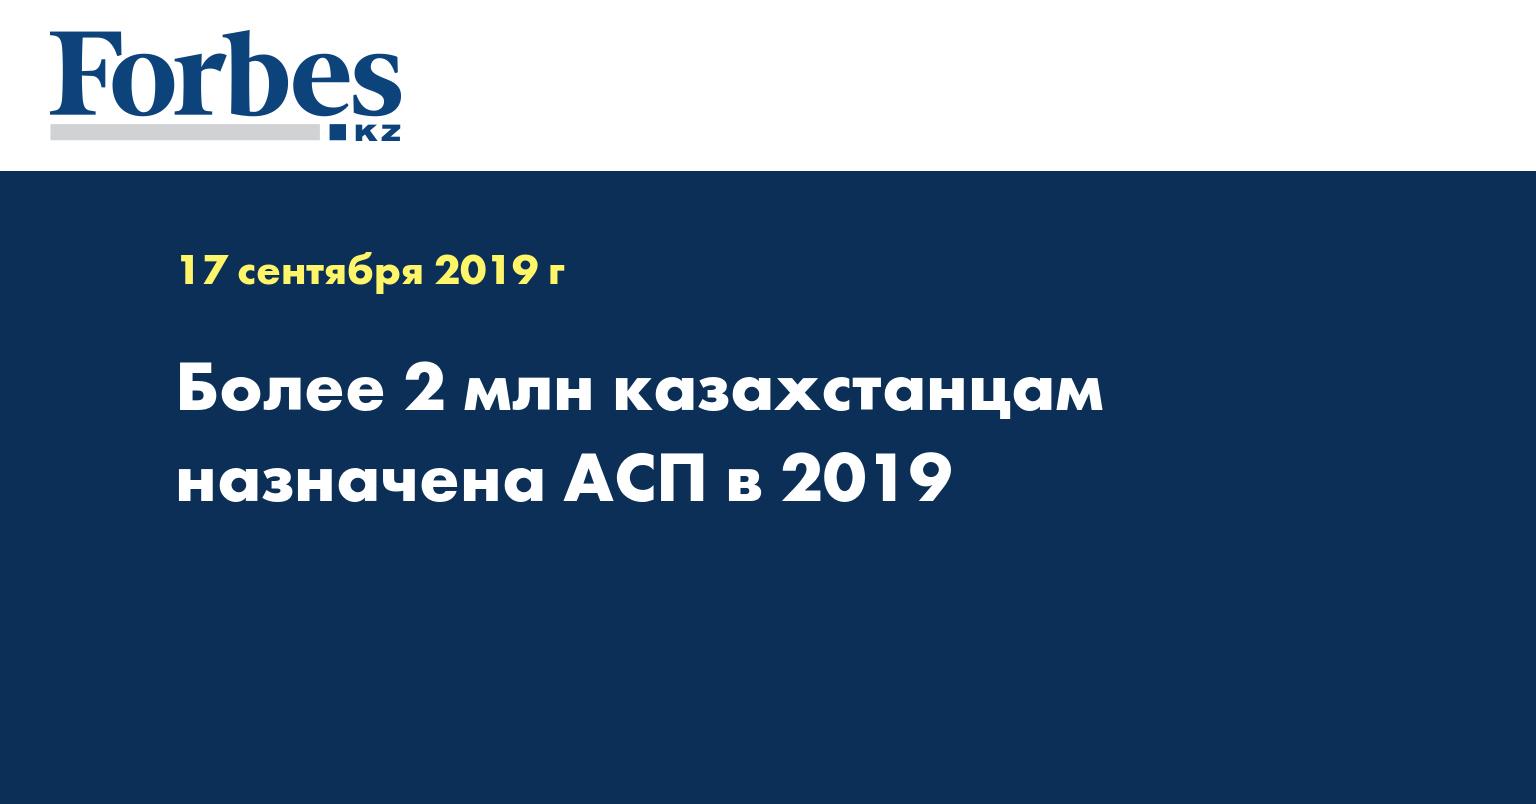 Более 2 млн казахстанцам назначена АСП в 2019